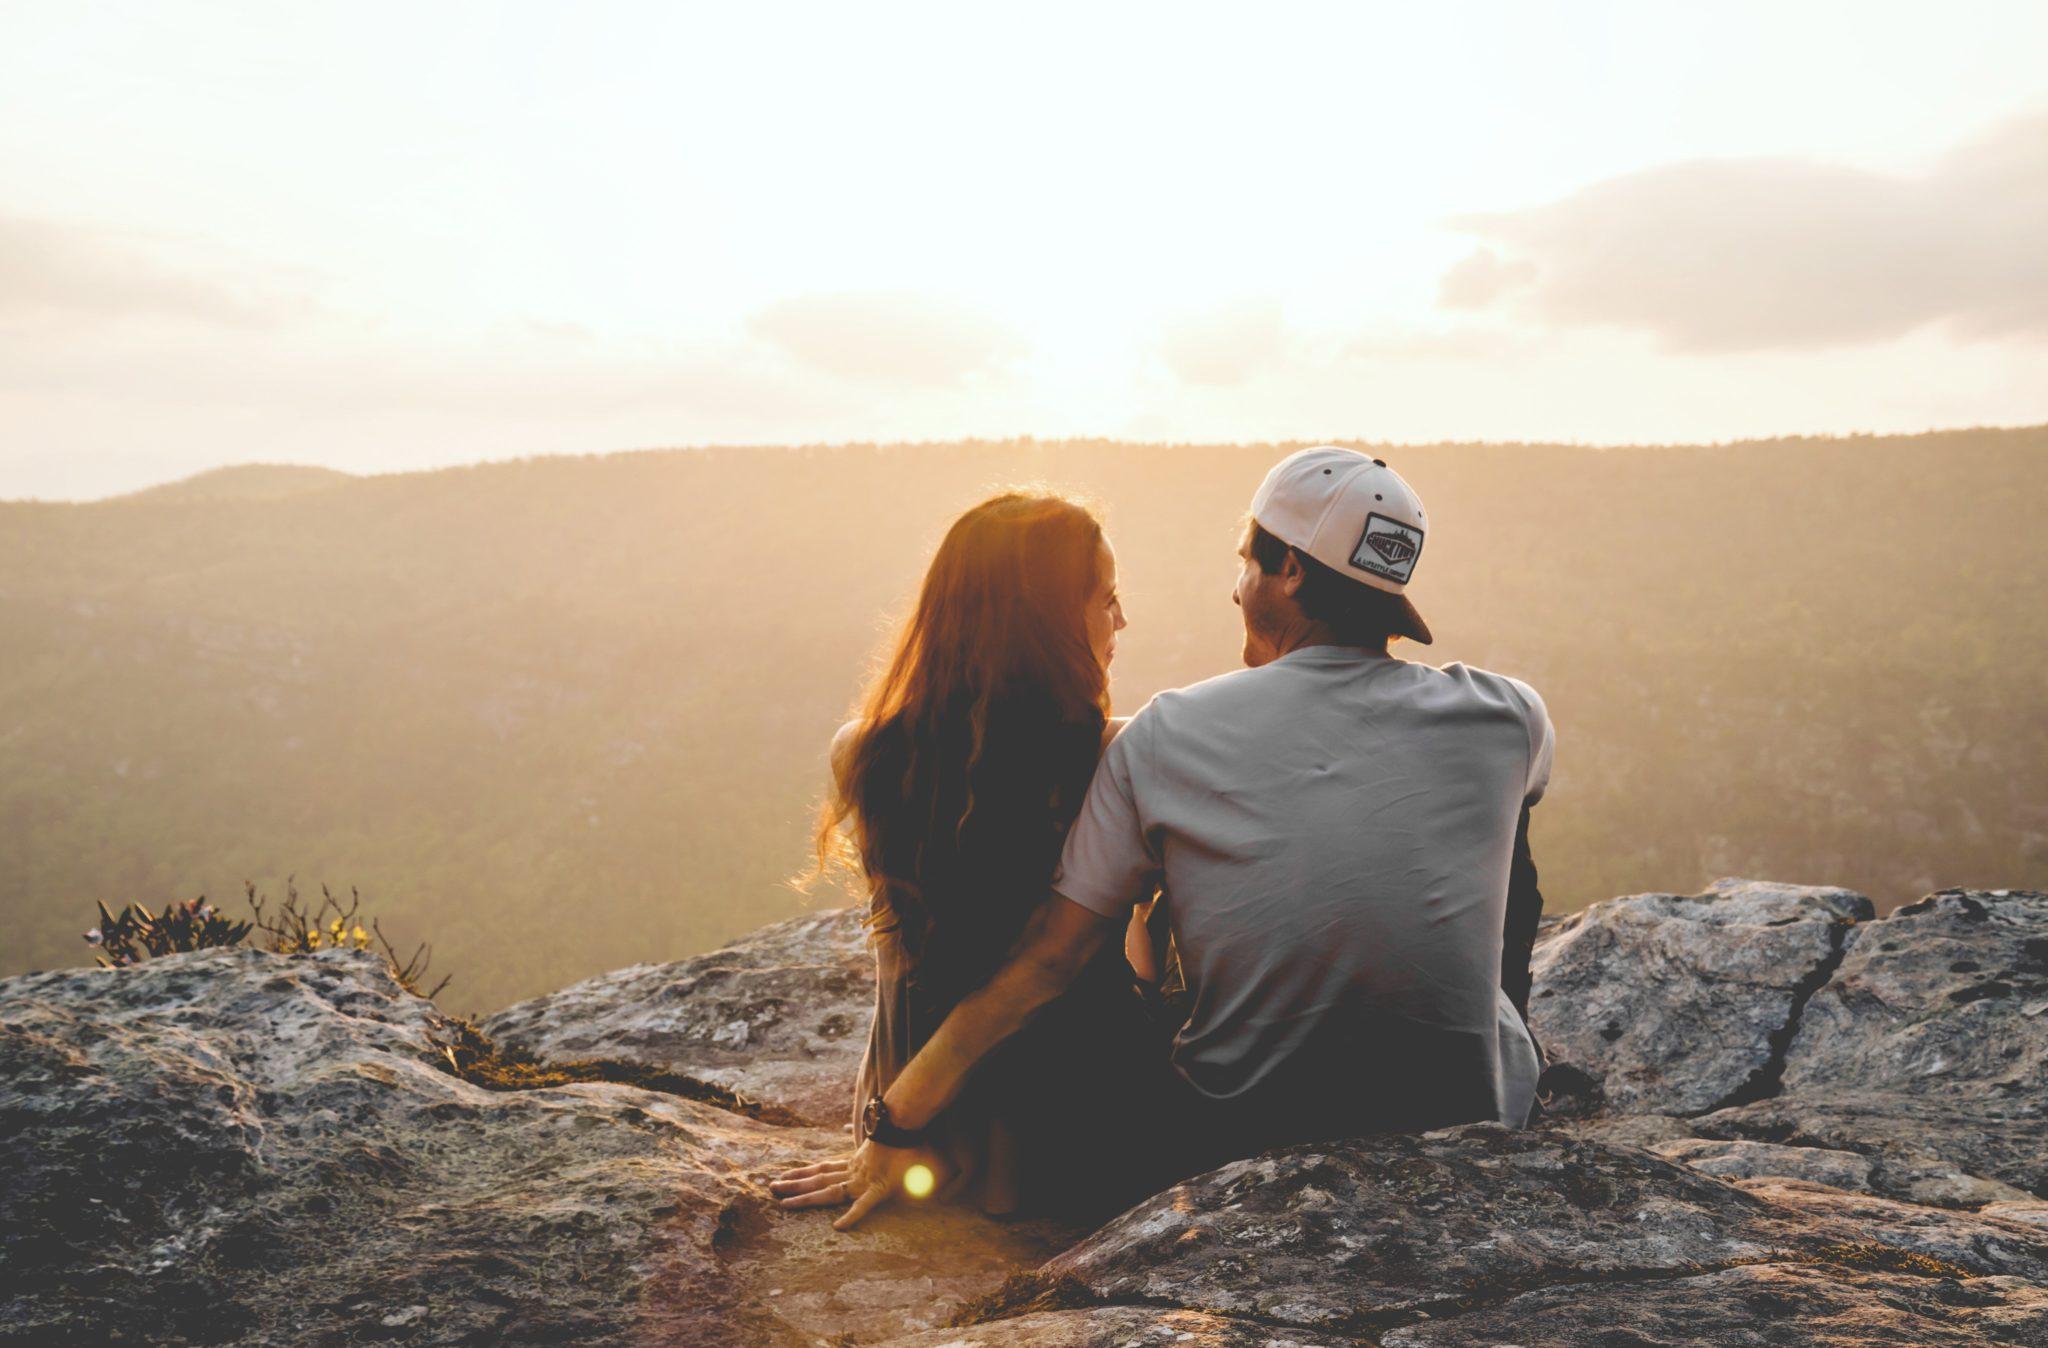 Adventurous Date Ideas - Watch the Sun Set